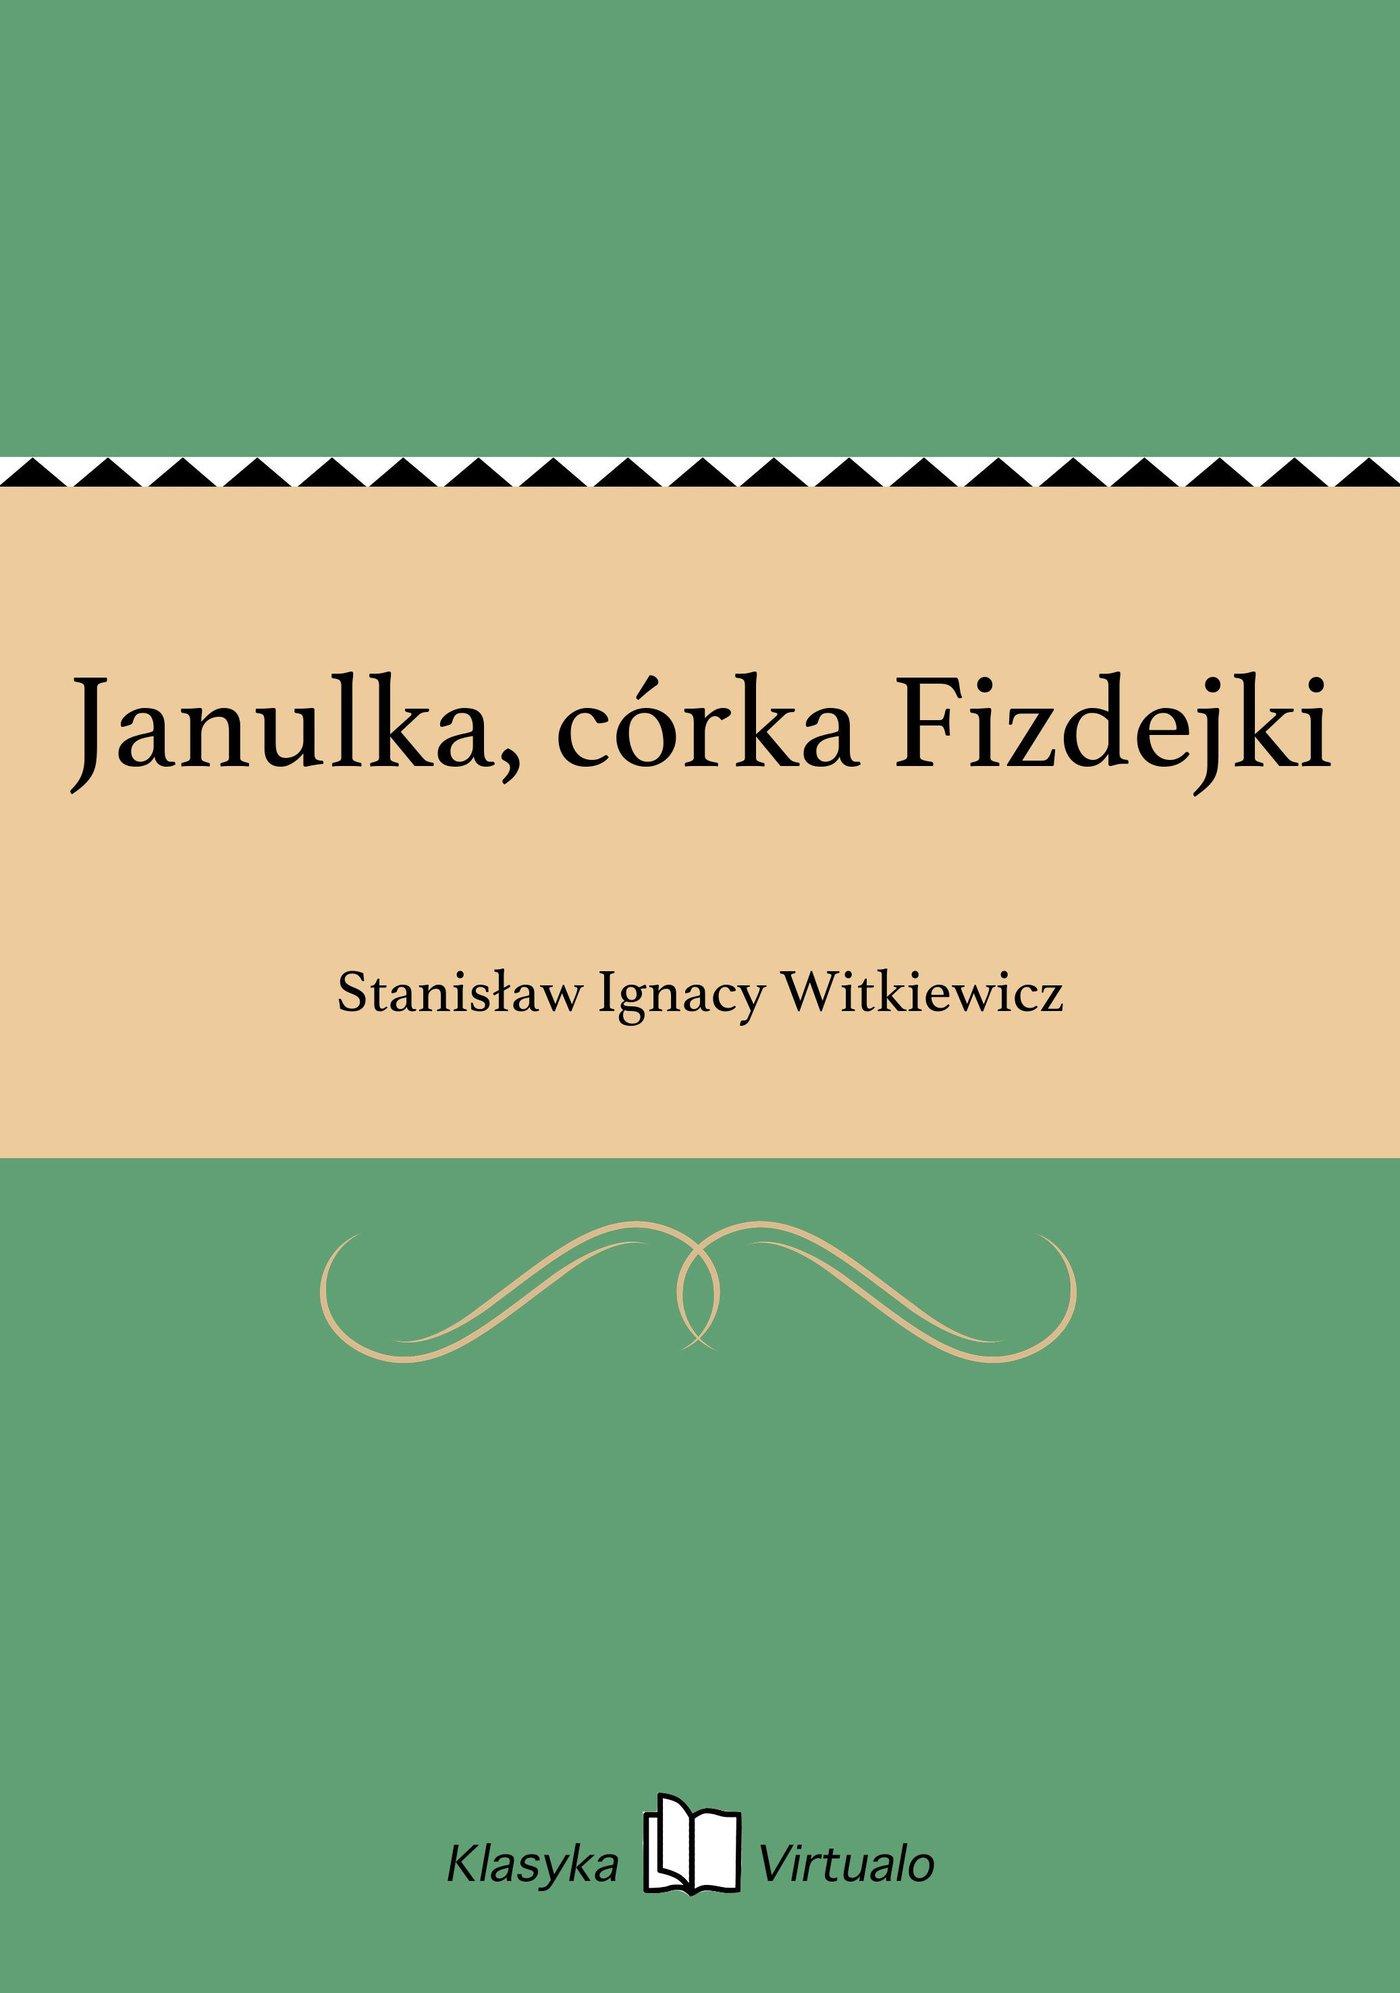 Janulka, córka Fizdejki - Ebook (Książka EPUB) do pobrania w formacie EPUB